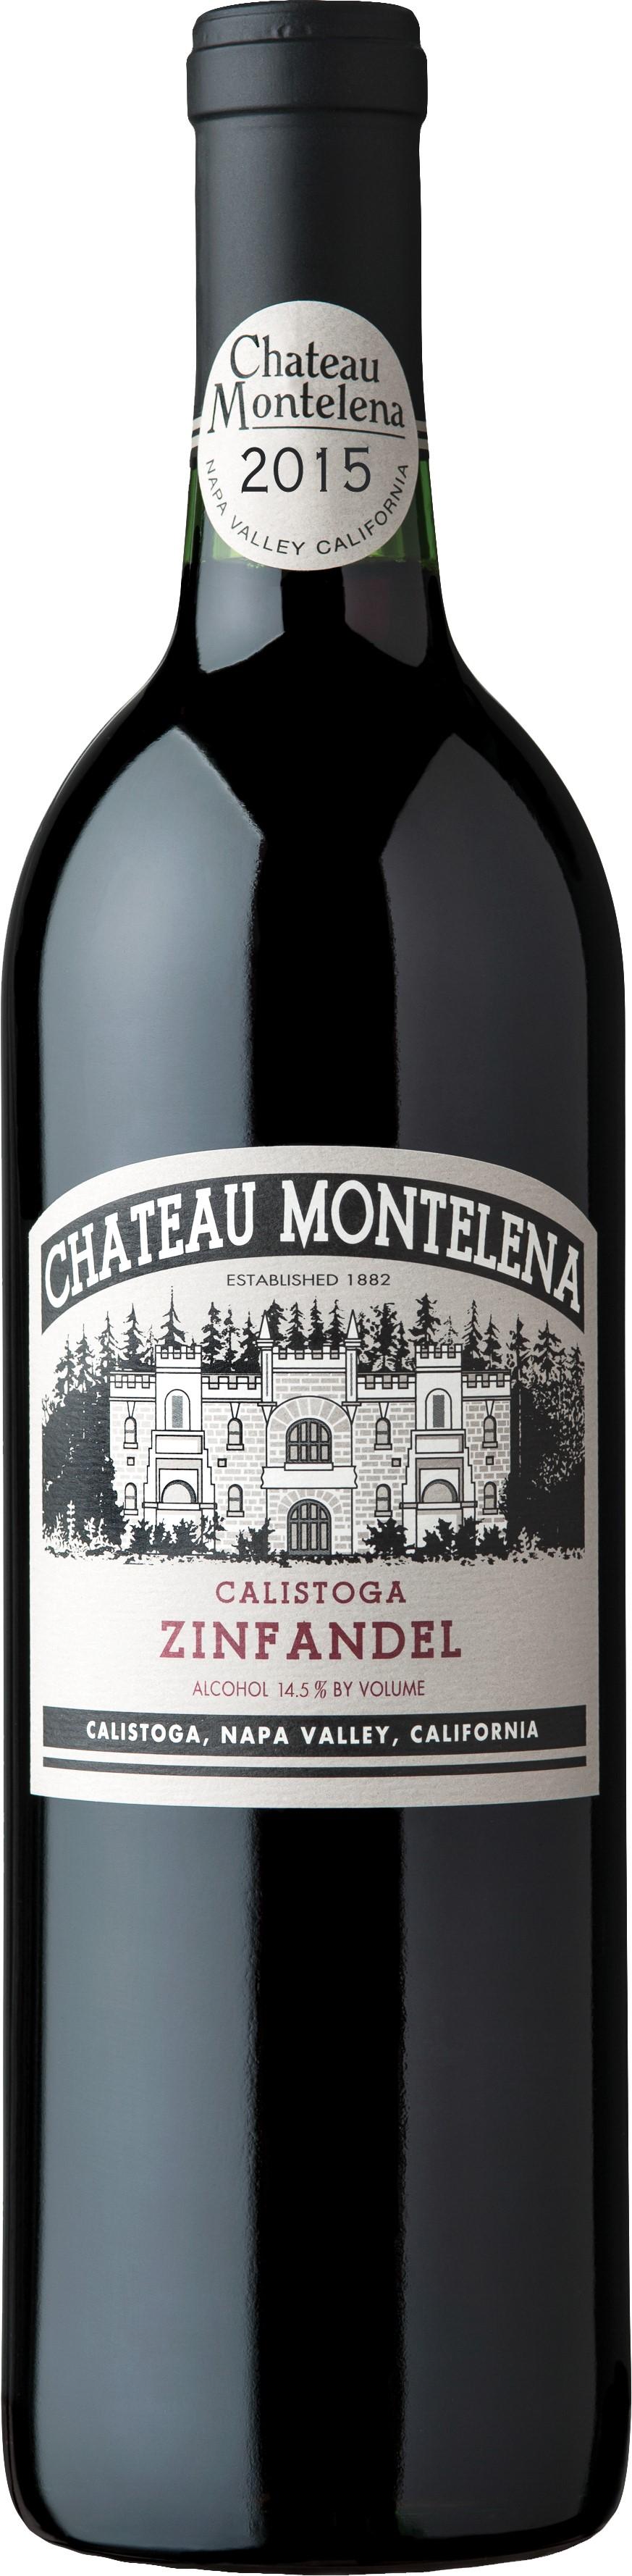 2015 Chateau Montelena Zinfandel Calistoga